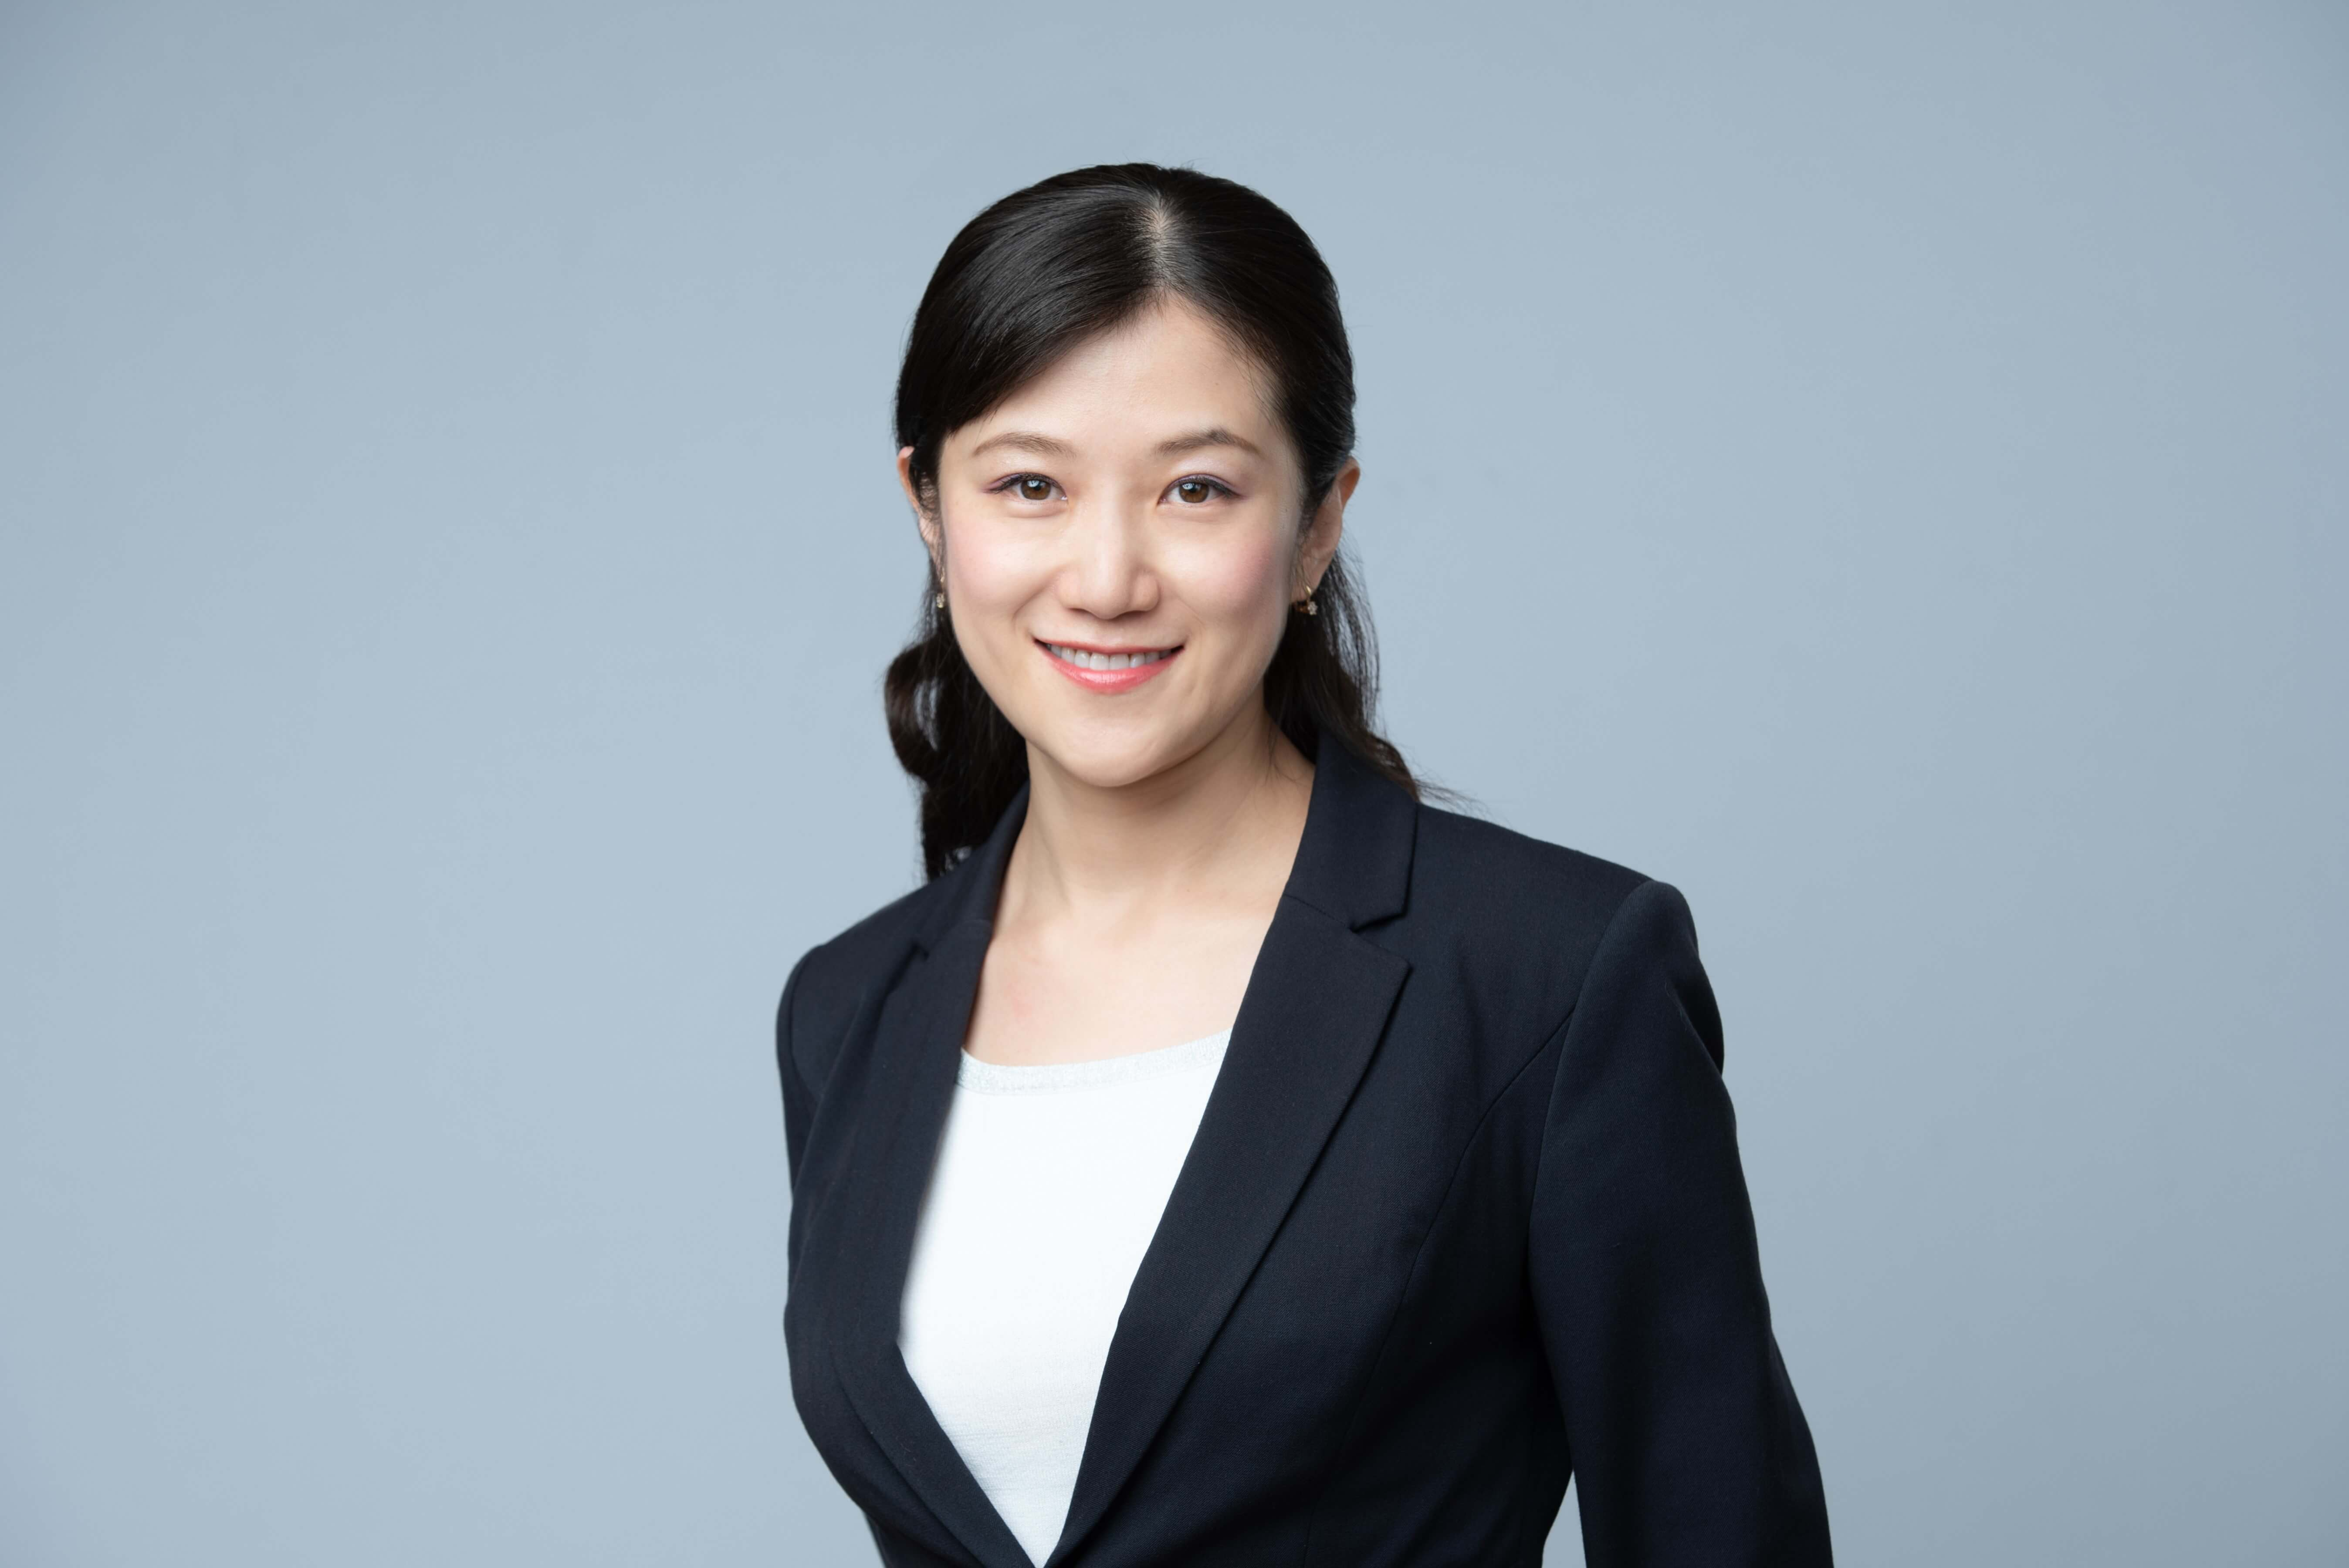 Dr. CHUNG Yeung, Vera profile image